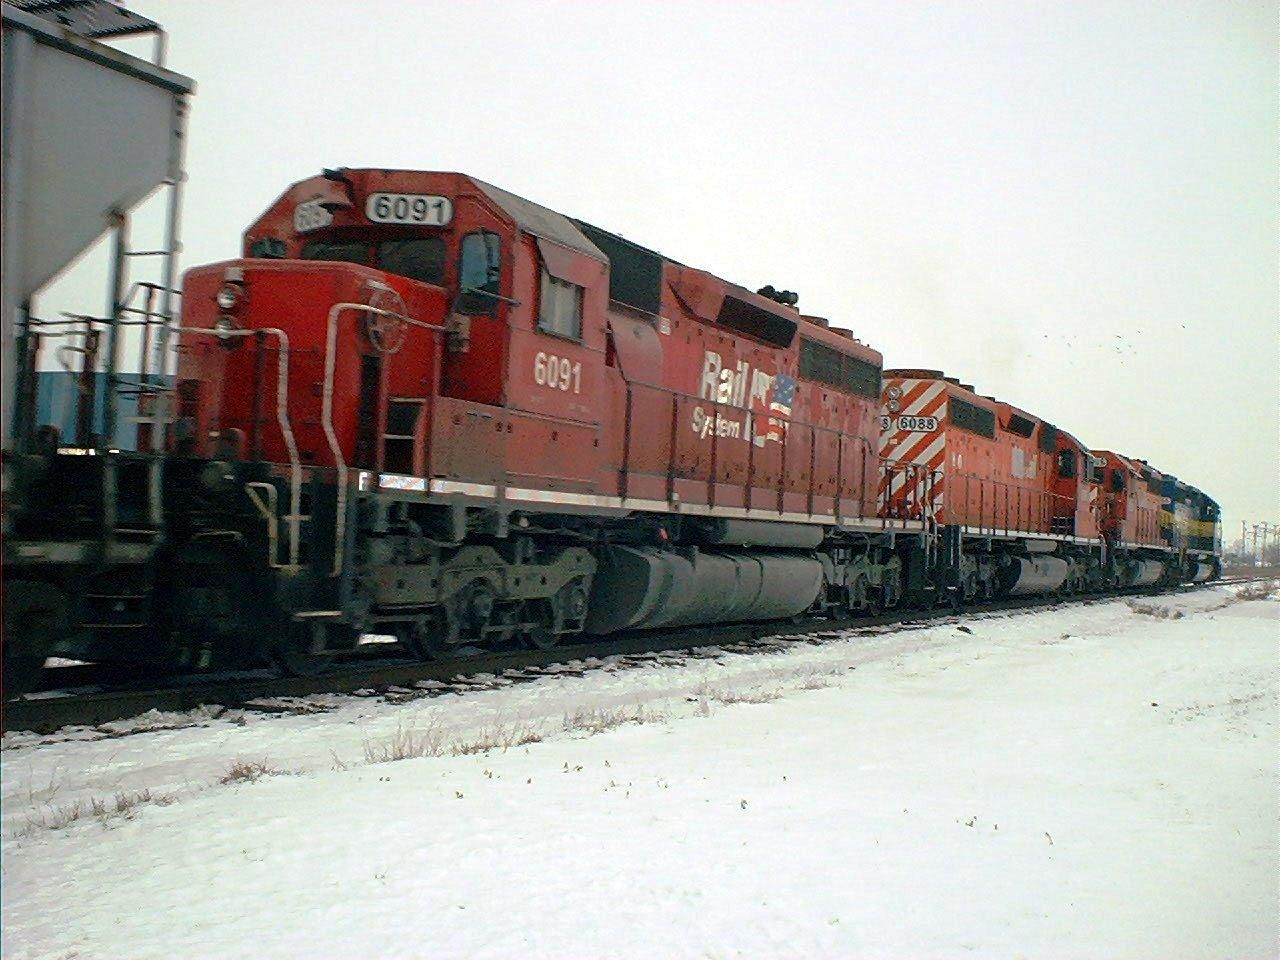 Fotos de trenes de carga 7